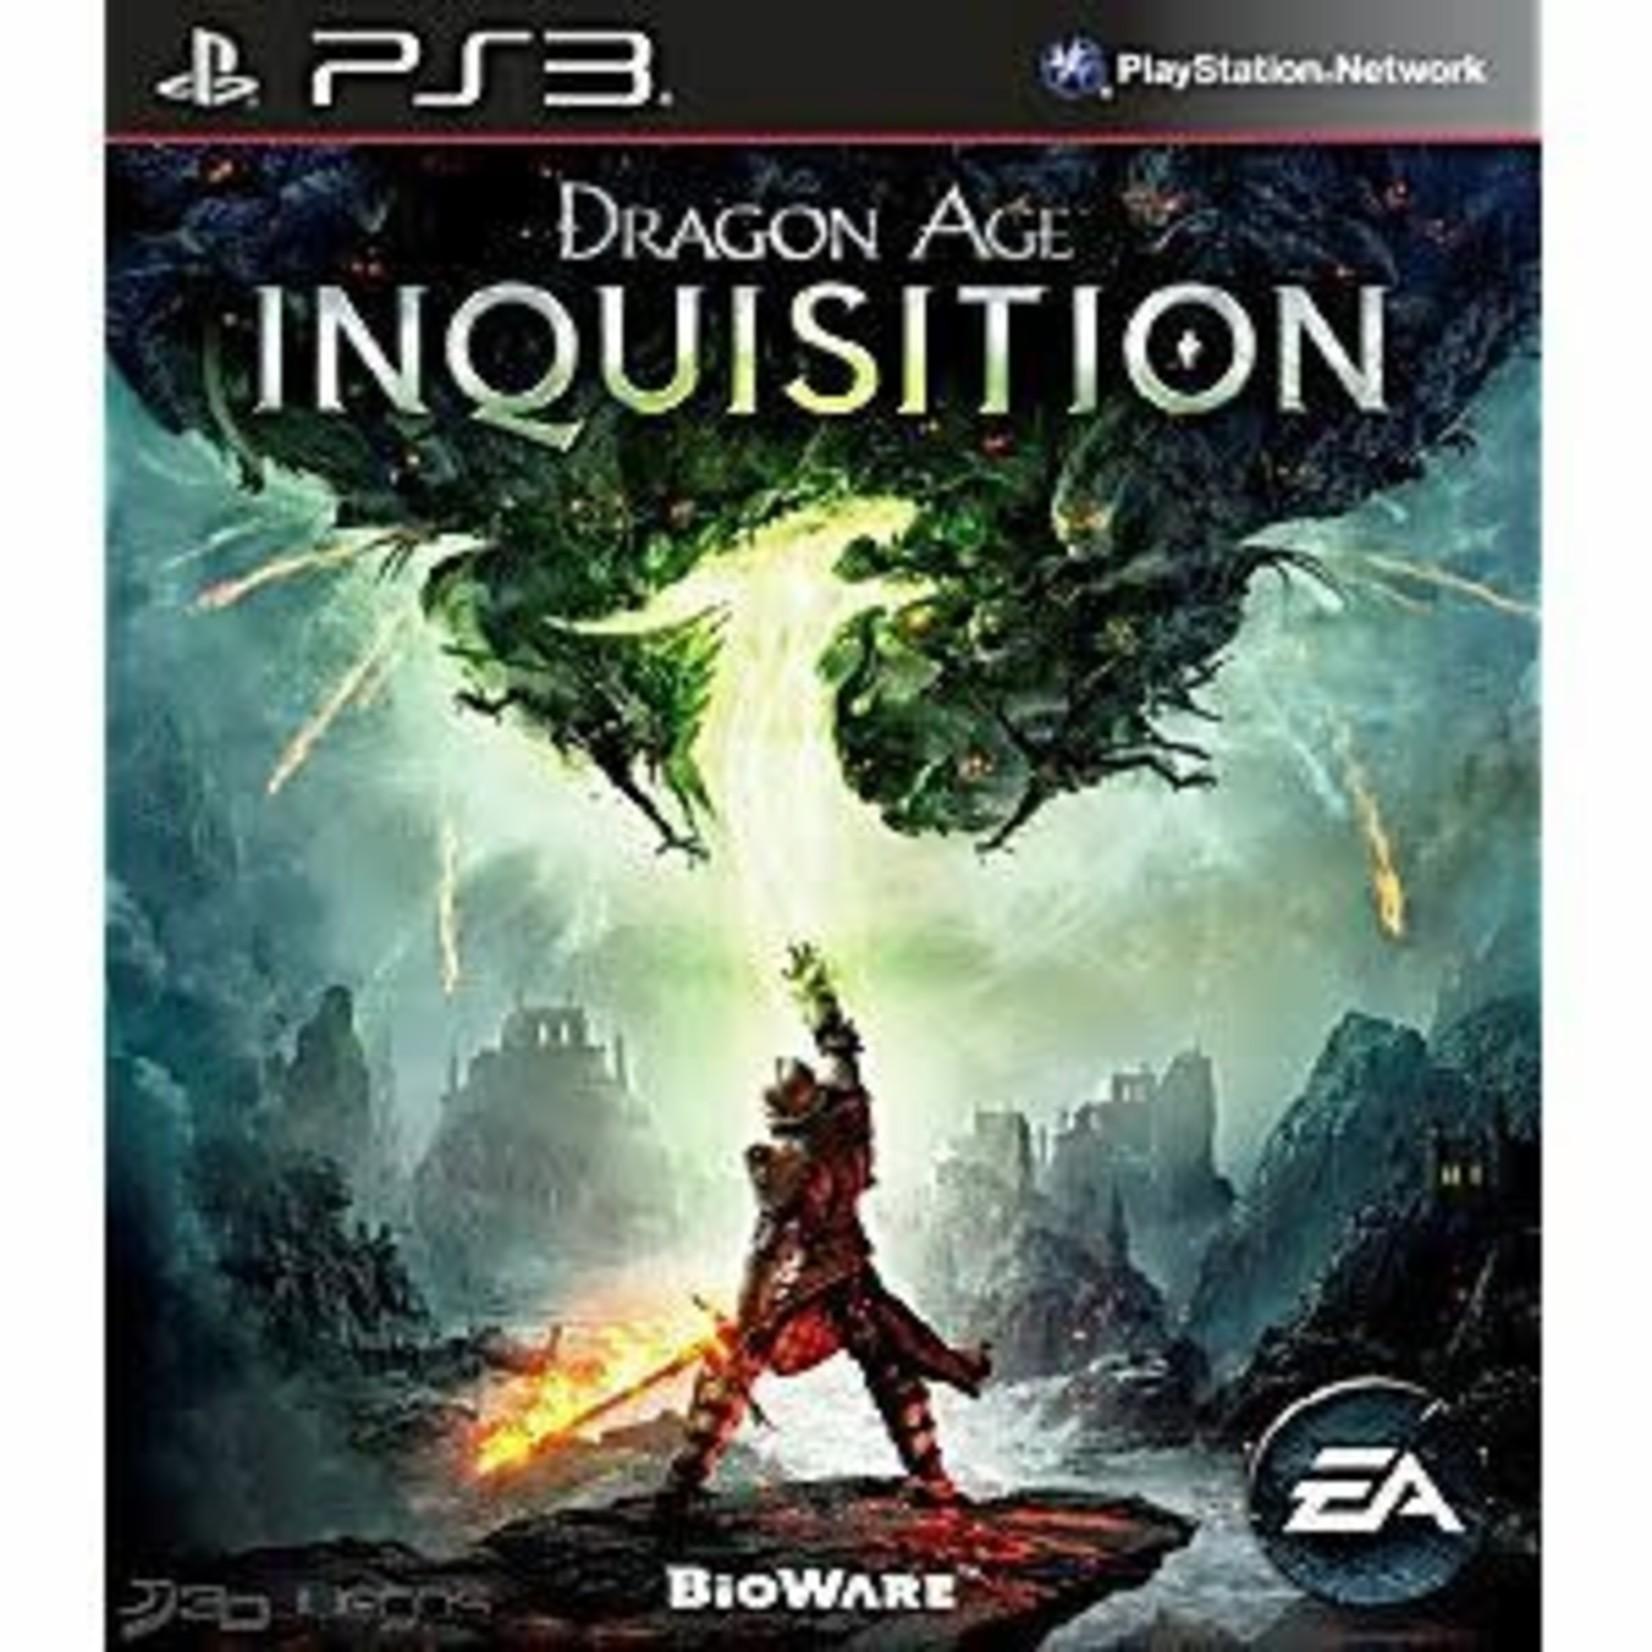 PS3U-Dragon Age: Inquisition